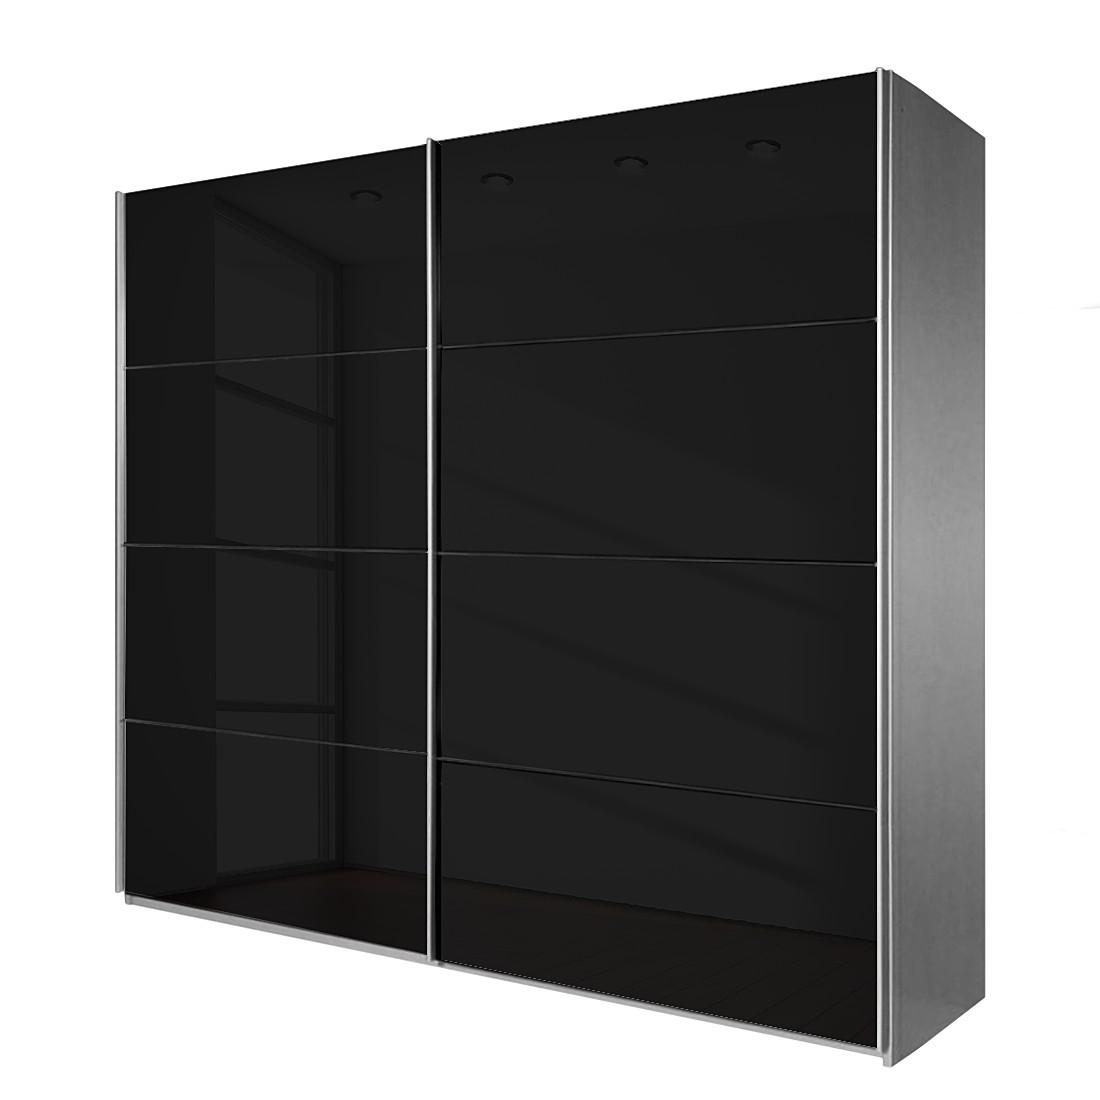 Schuifdeurkast Quadra II - Aluminiumkleurig/zwart glas - 271cm (2-deurs) - 210cm, Rauch